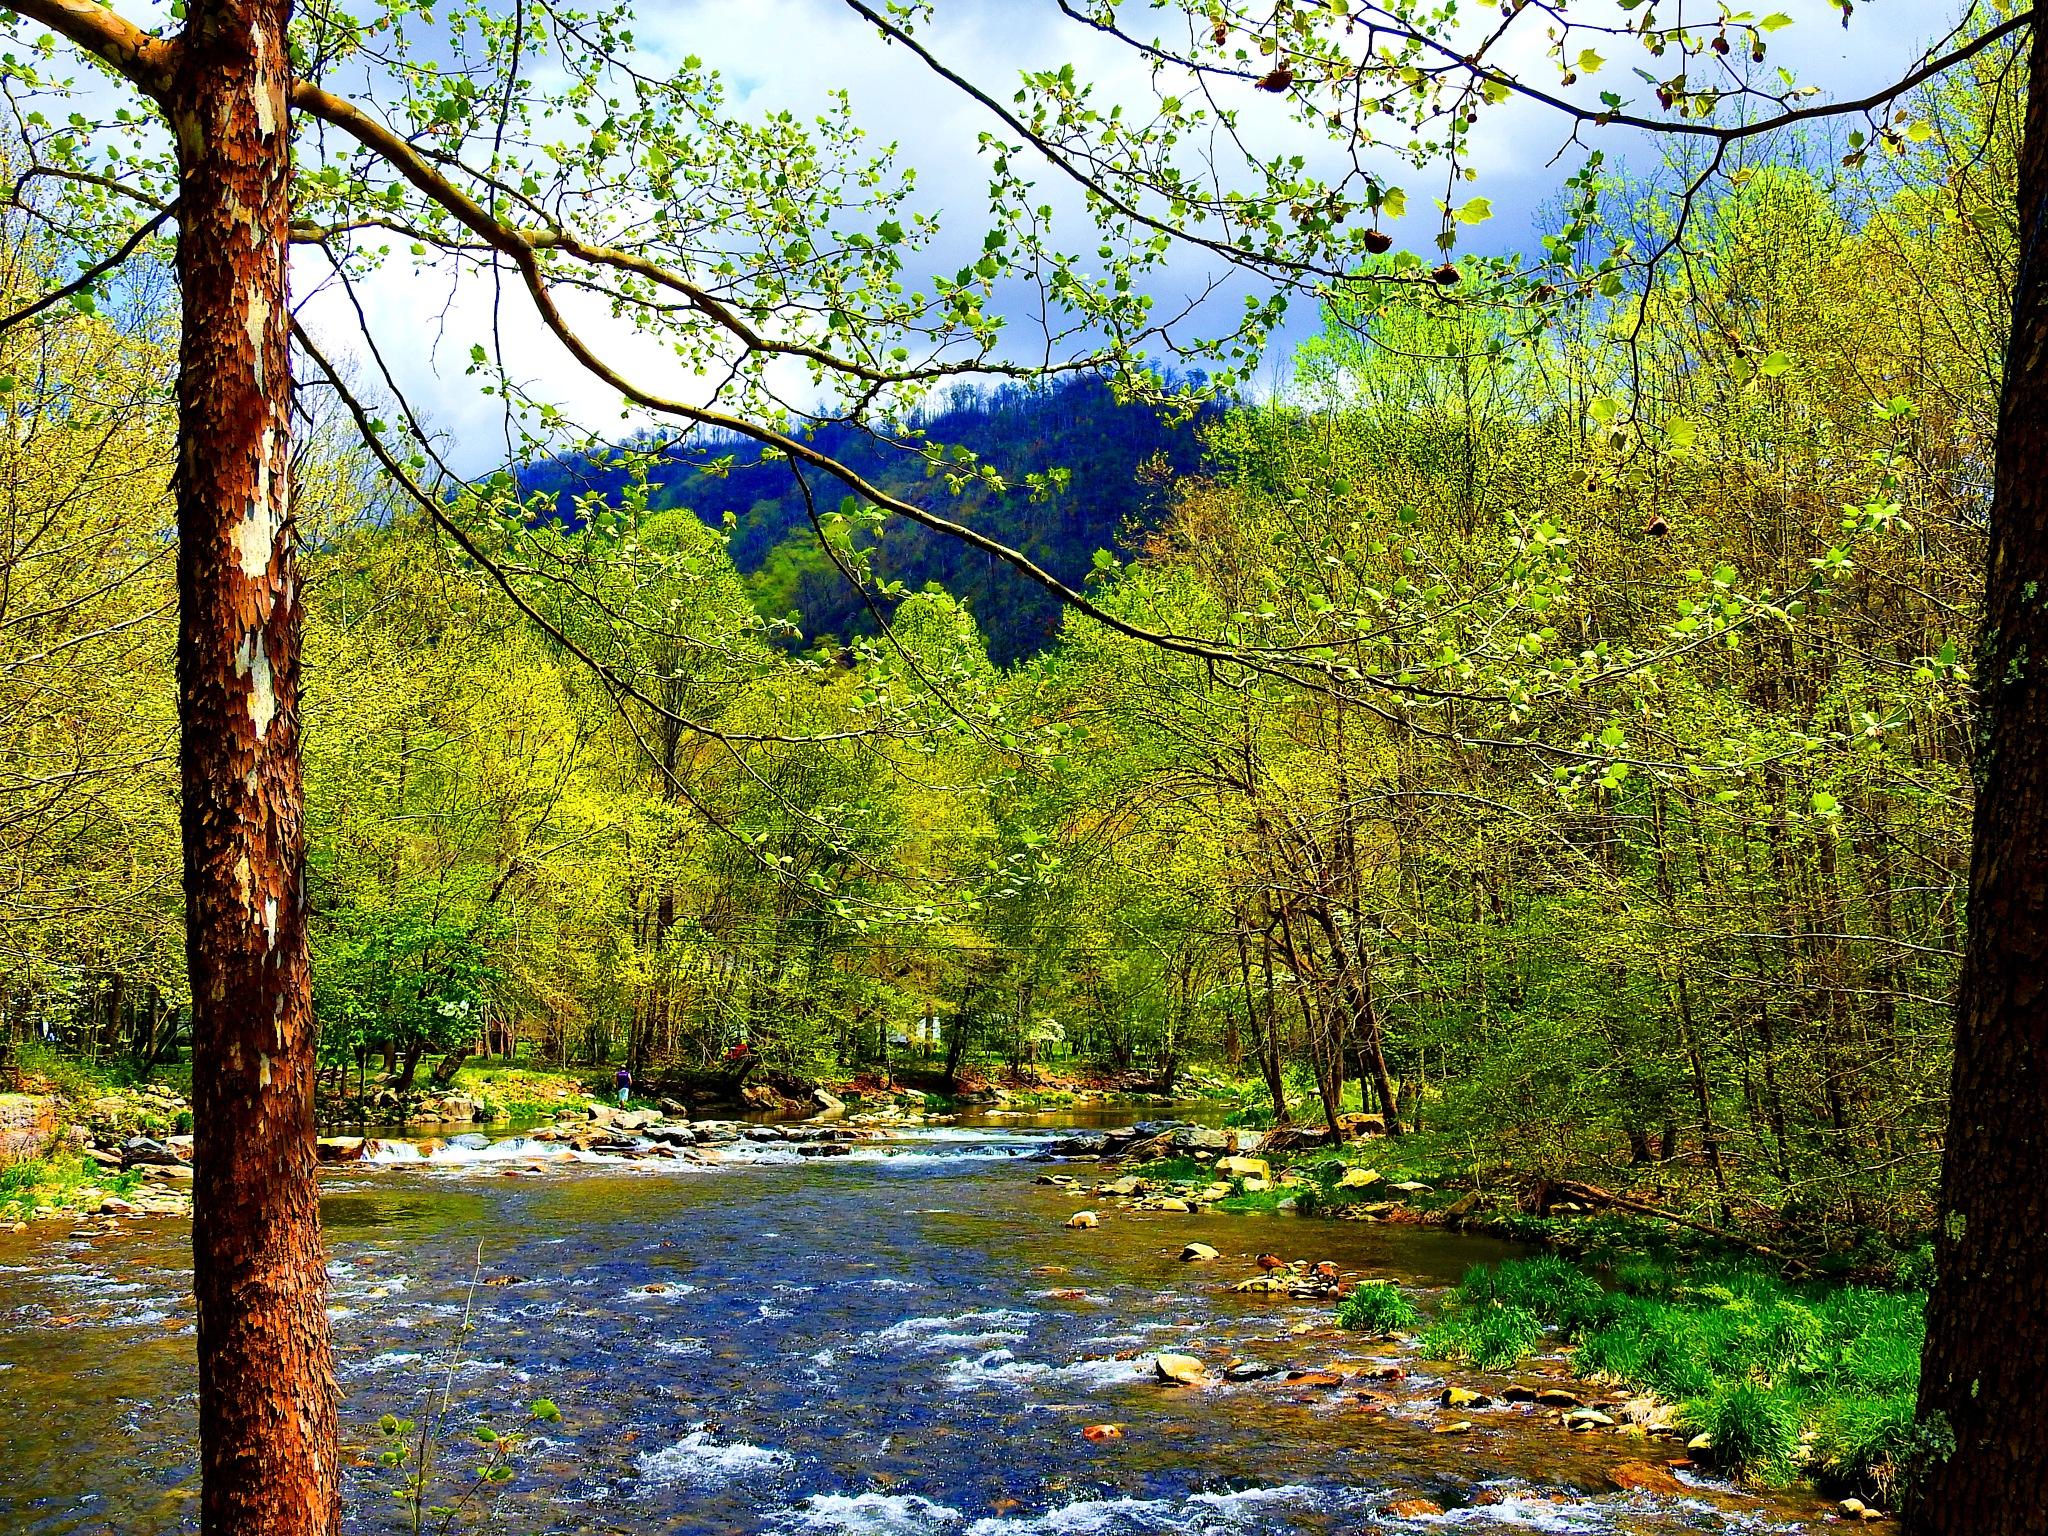 Spring Stream by Patty Stockton